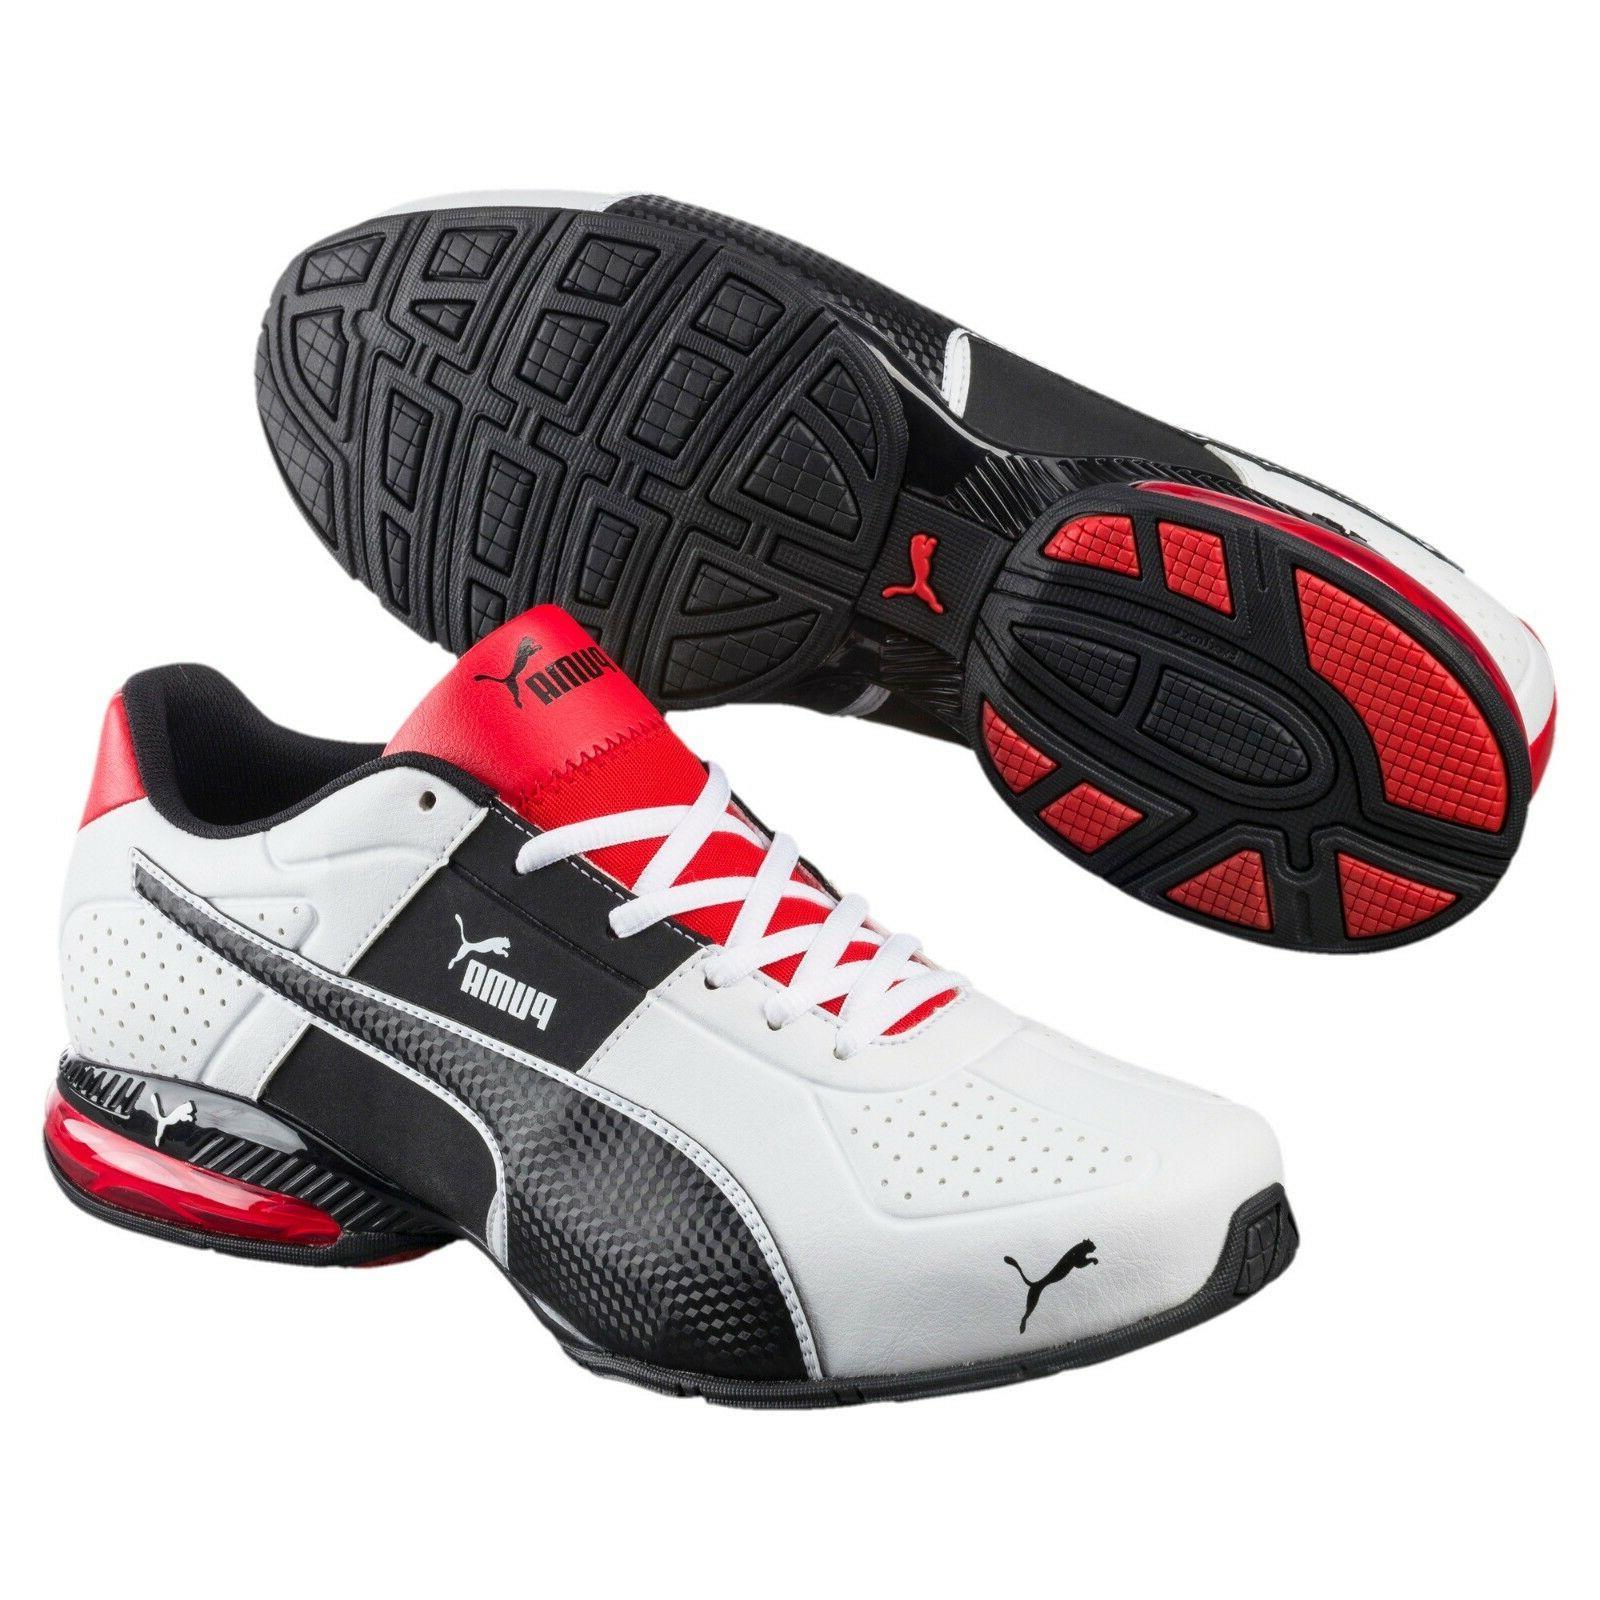 NEW $80 PUMA Cell Surin 2 FM Men's Running Shoes 189876